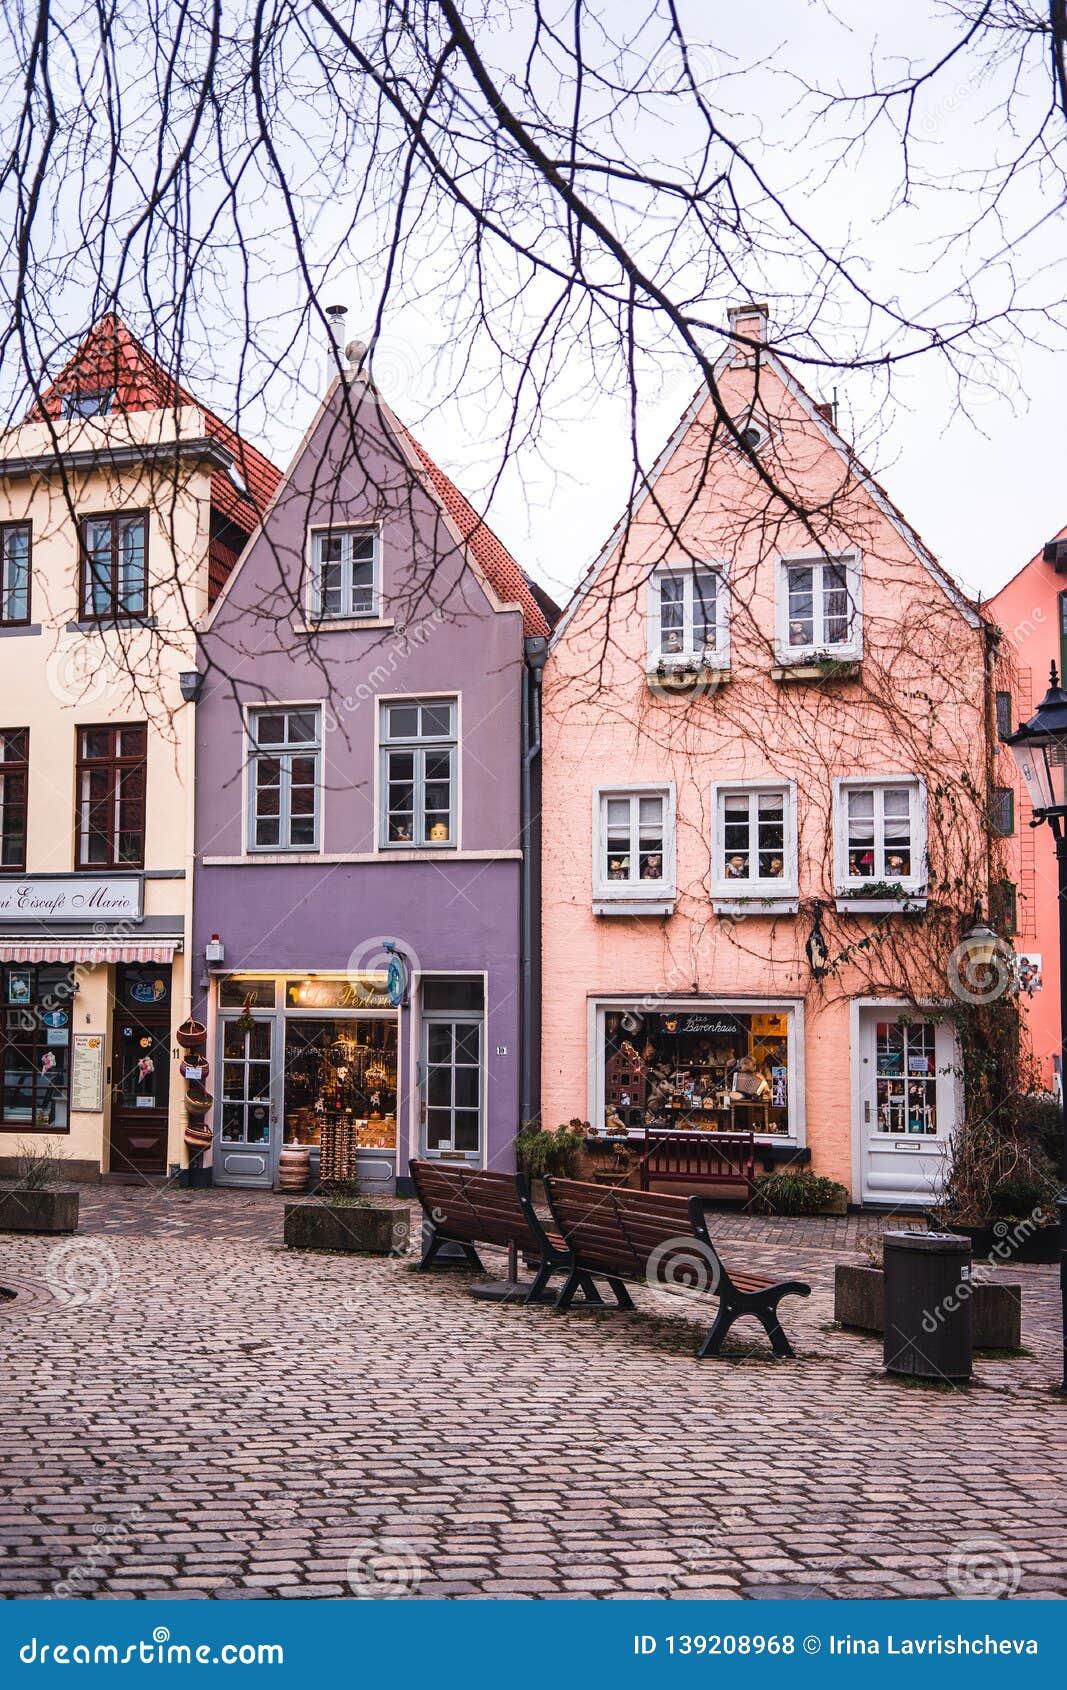 Bremen, Germany, January, 2019 - Colorful houses in historic Schnoorviertel in Bremen, Germany